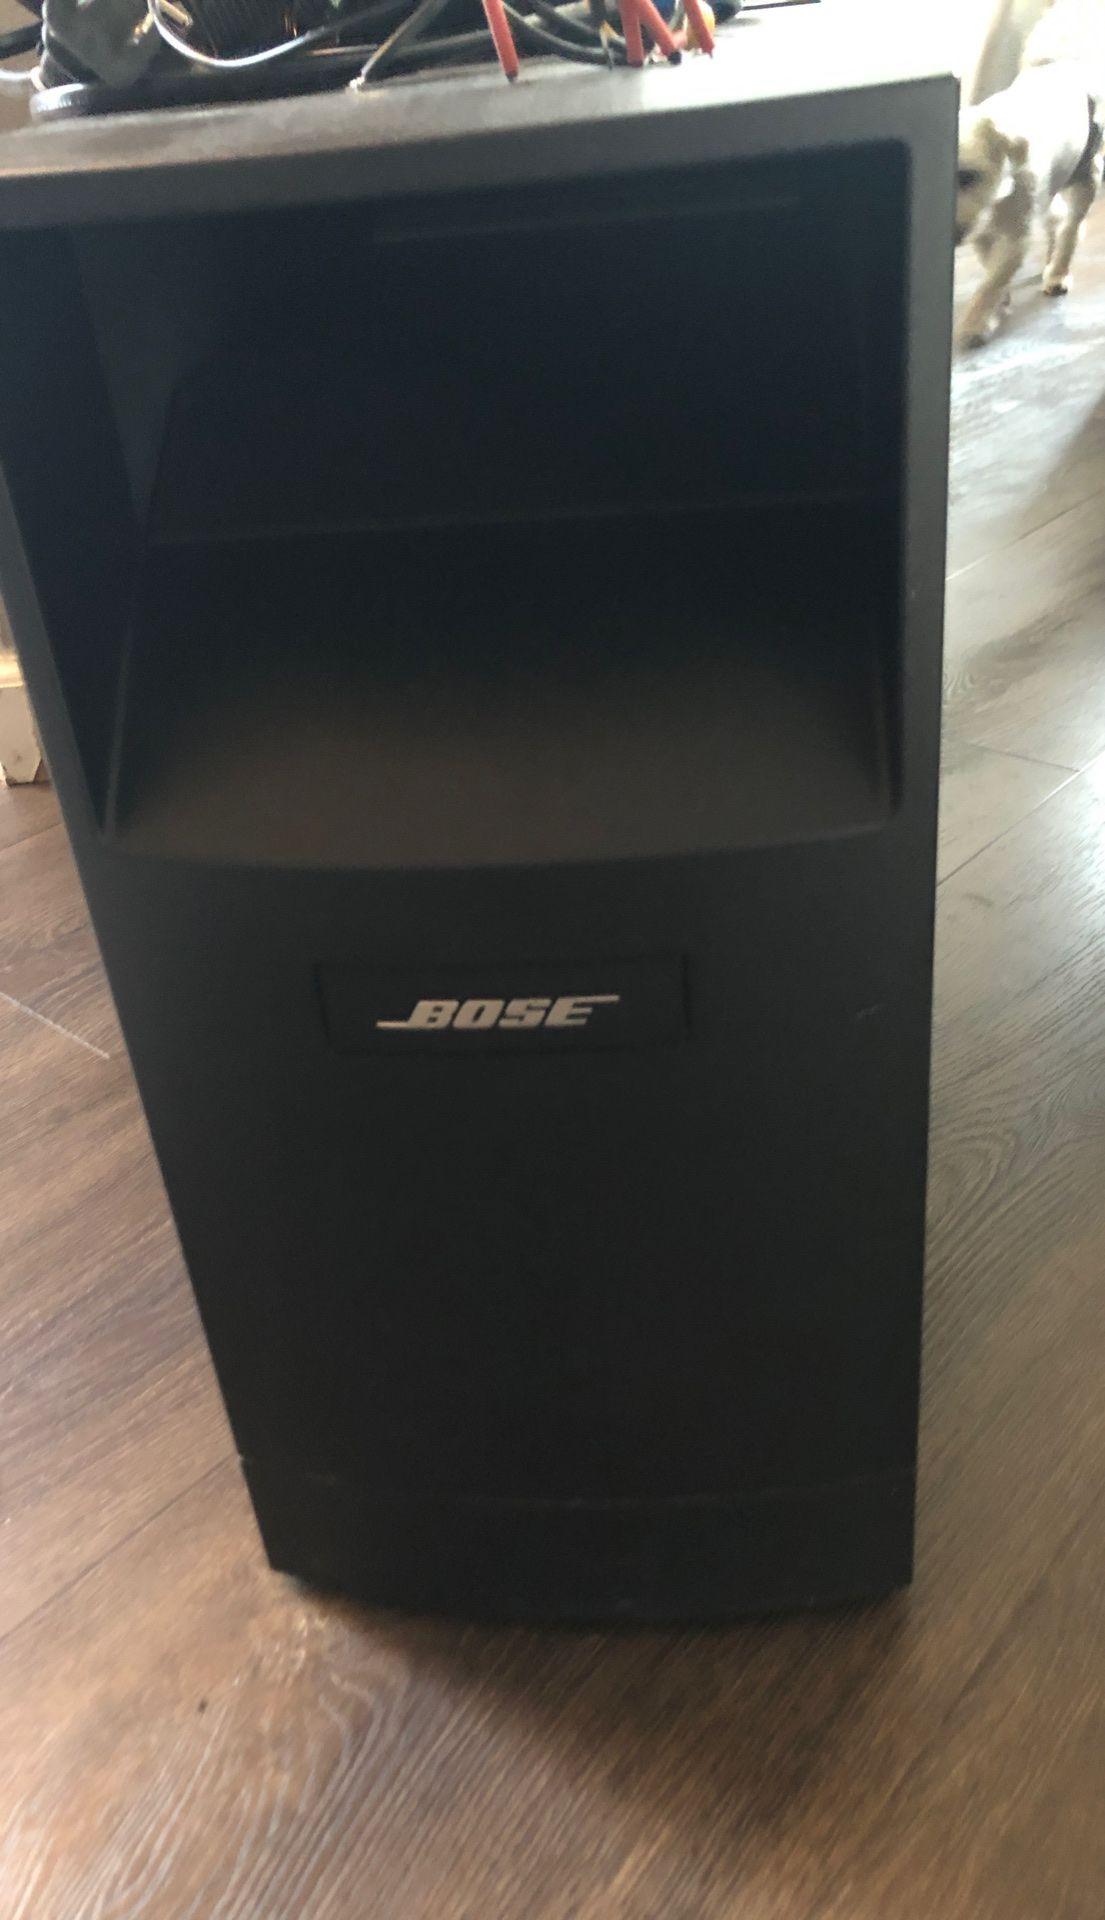 Bose surround sound